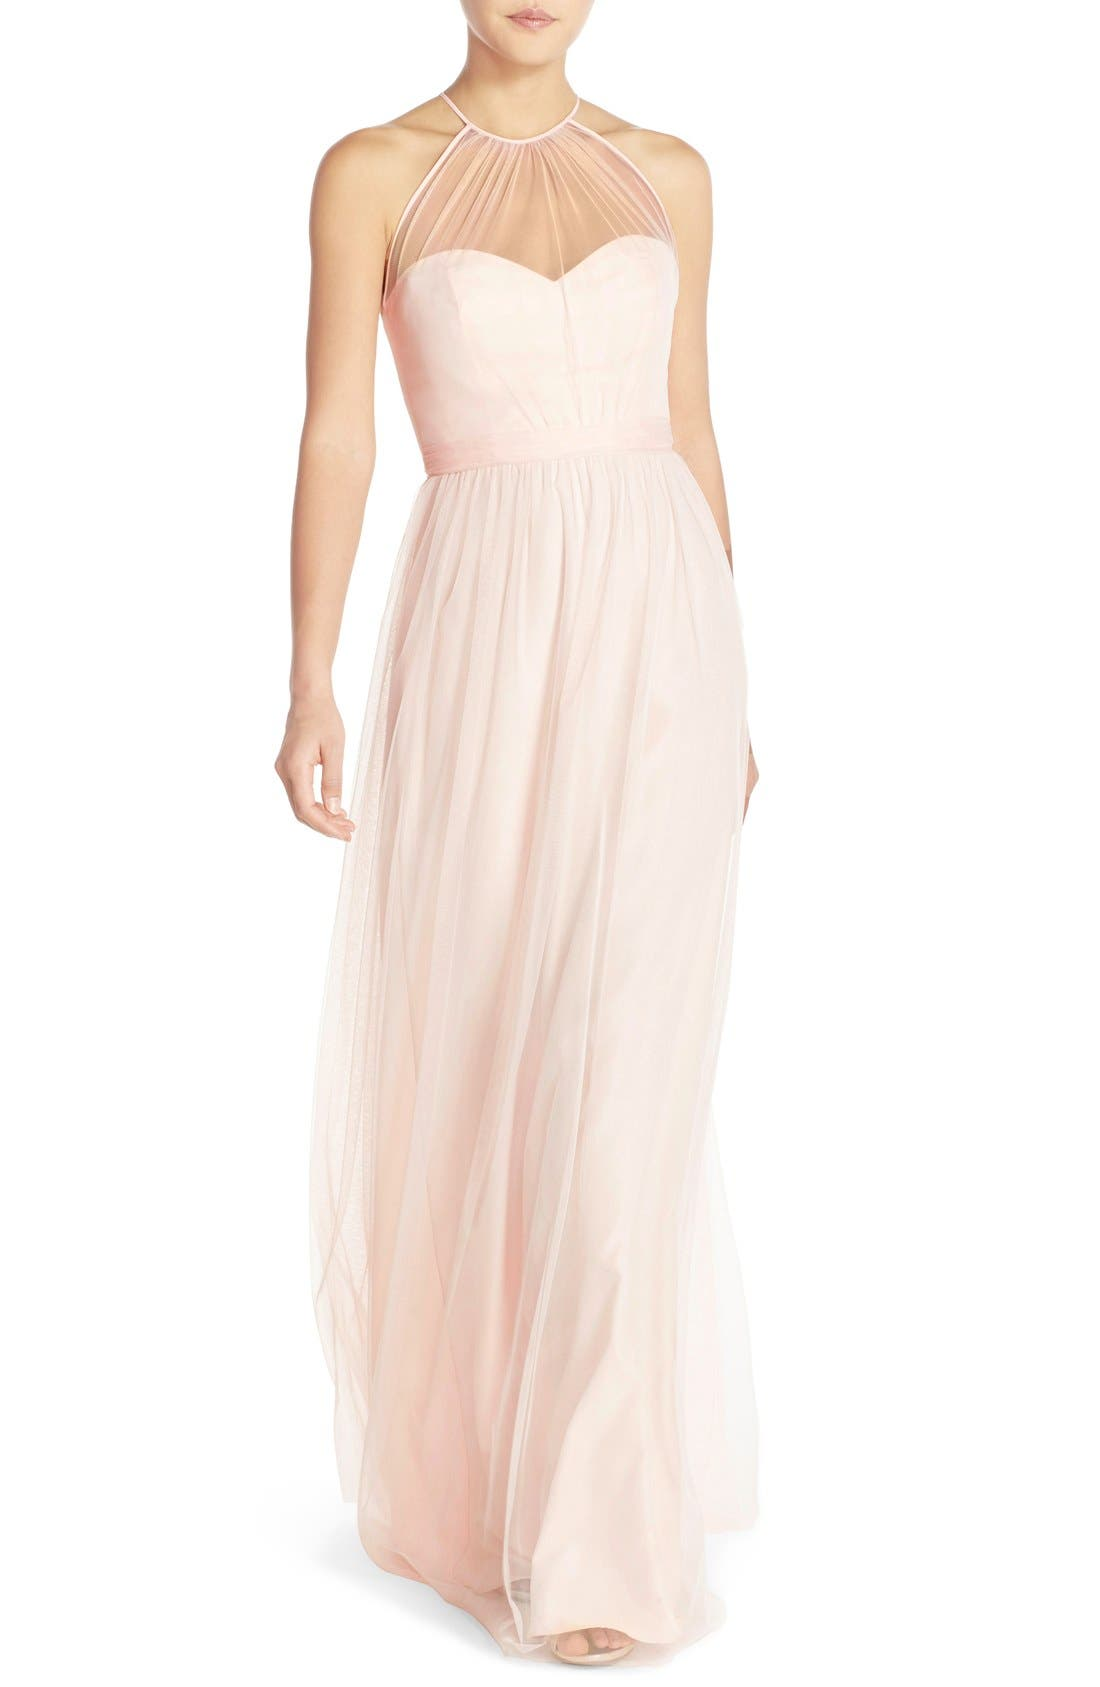 Main Image - Amsale 'Aliki' Illusion Yoke Tulle Halter Gown